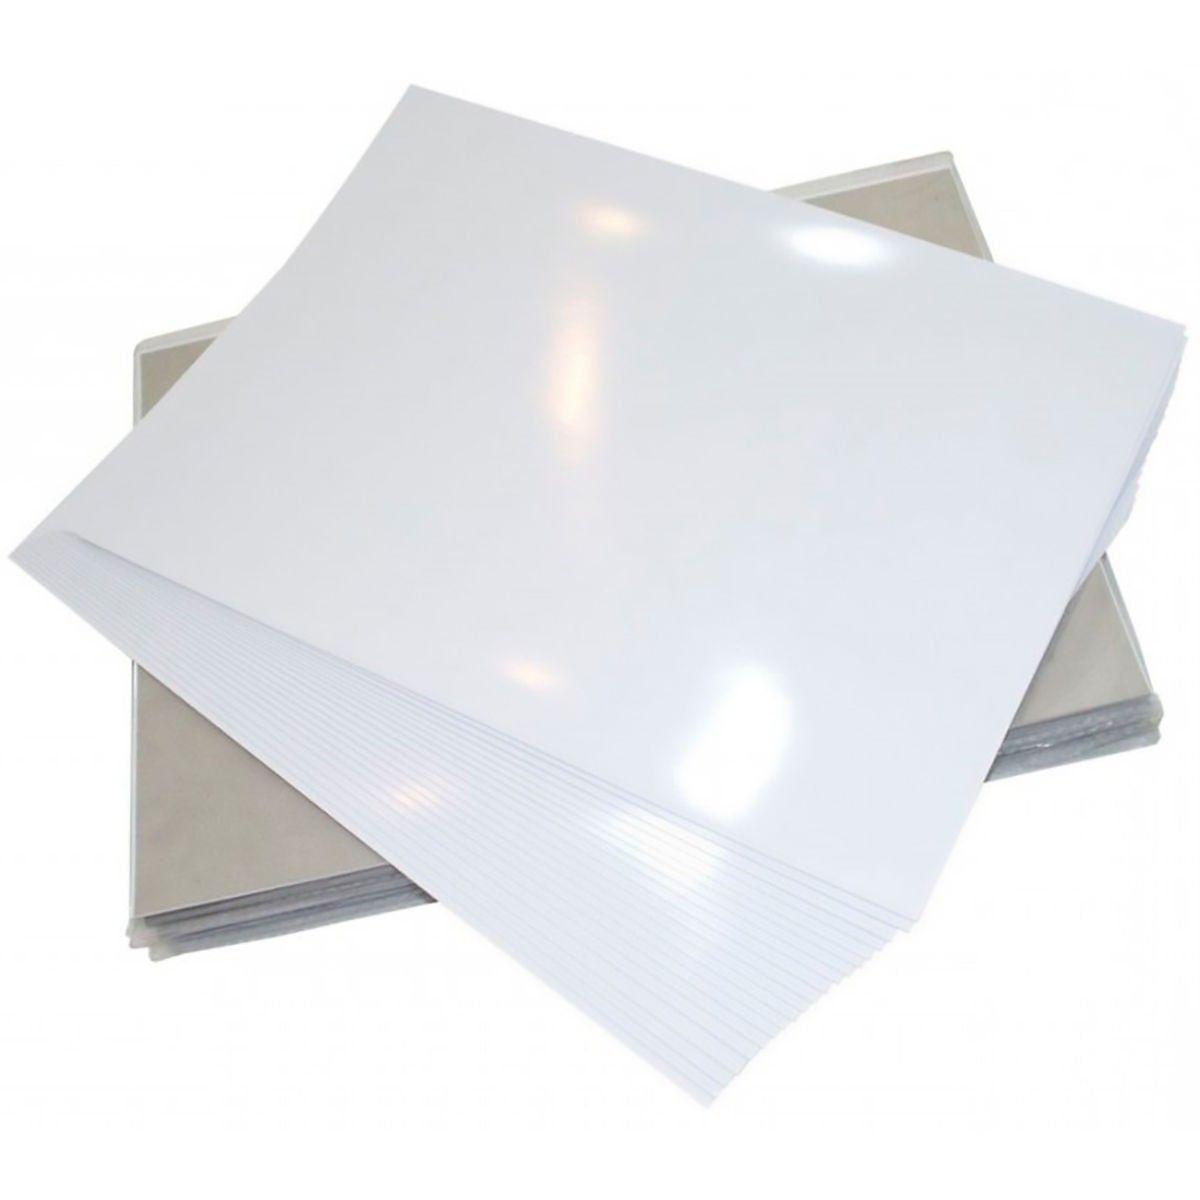 Papel Fotográfico A4 Dupla Face 220g Glossy Branco Brilhante Resistente à Água / 300 folhas